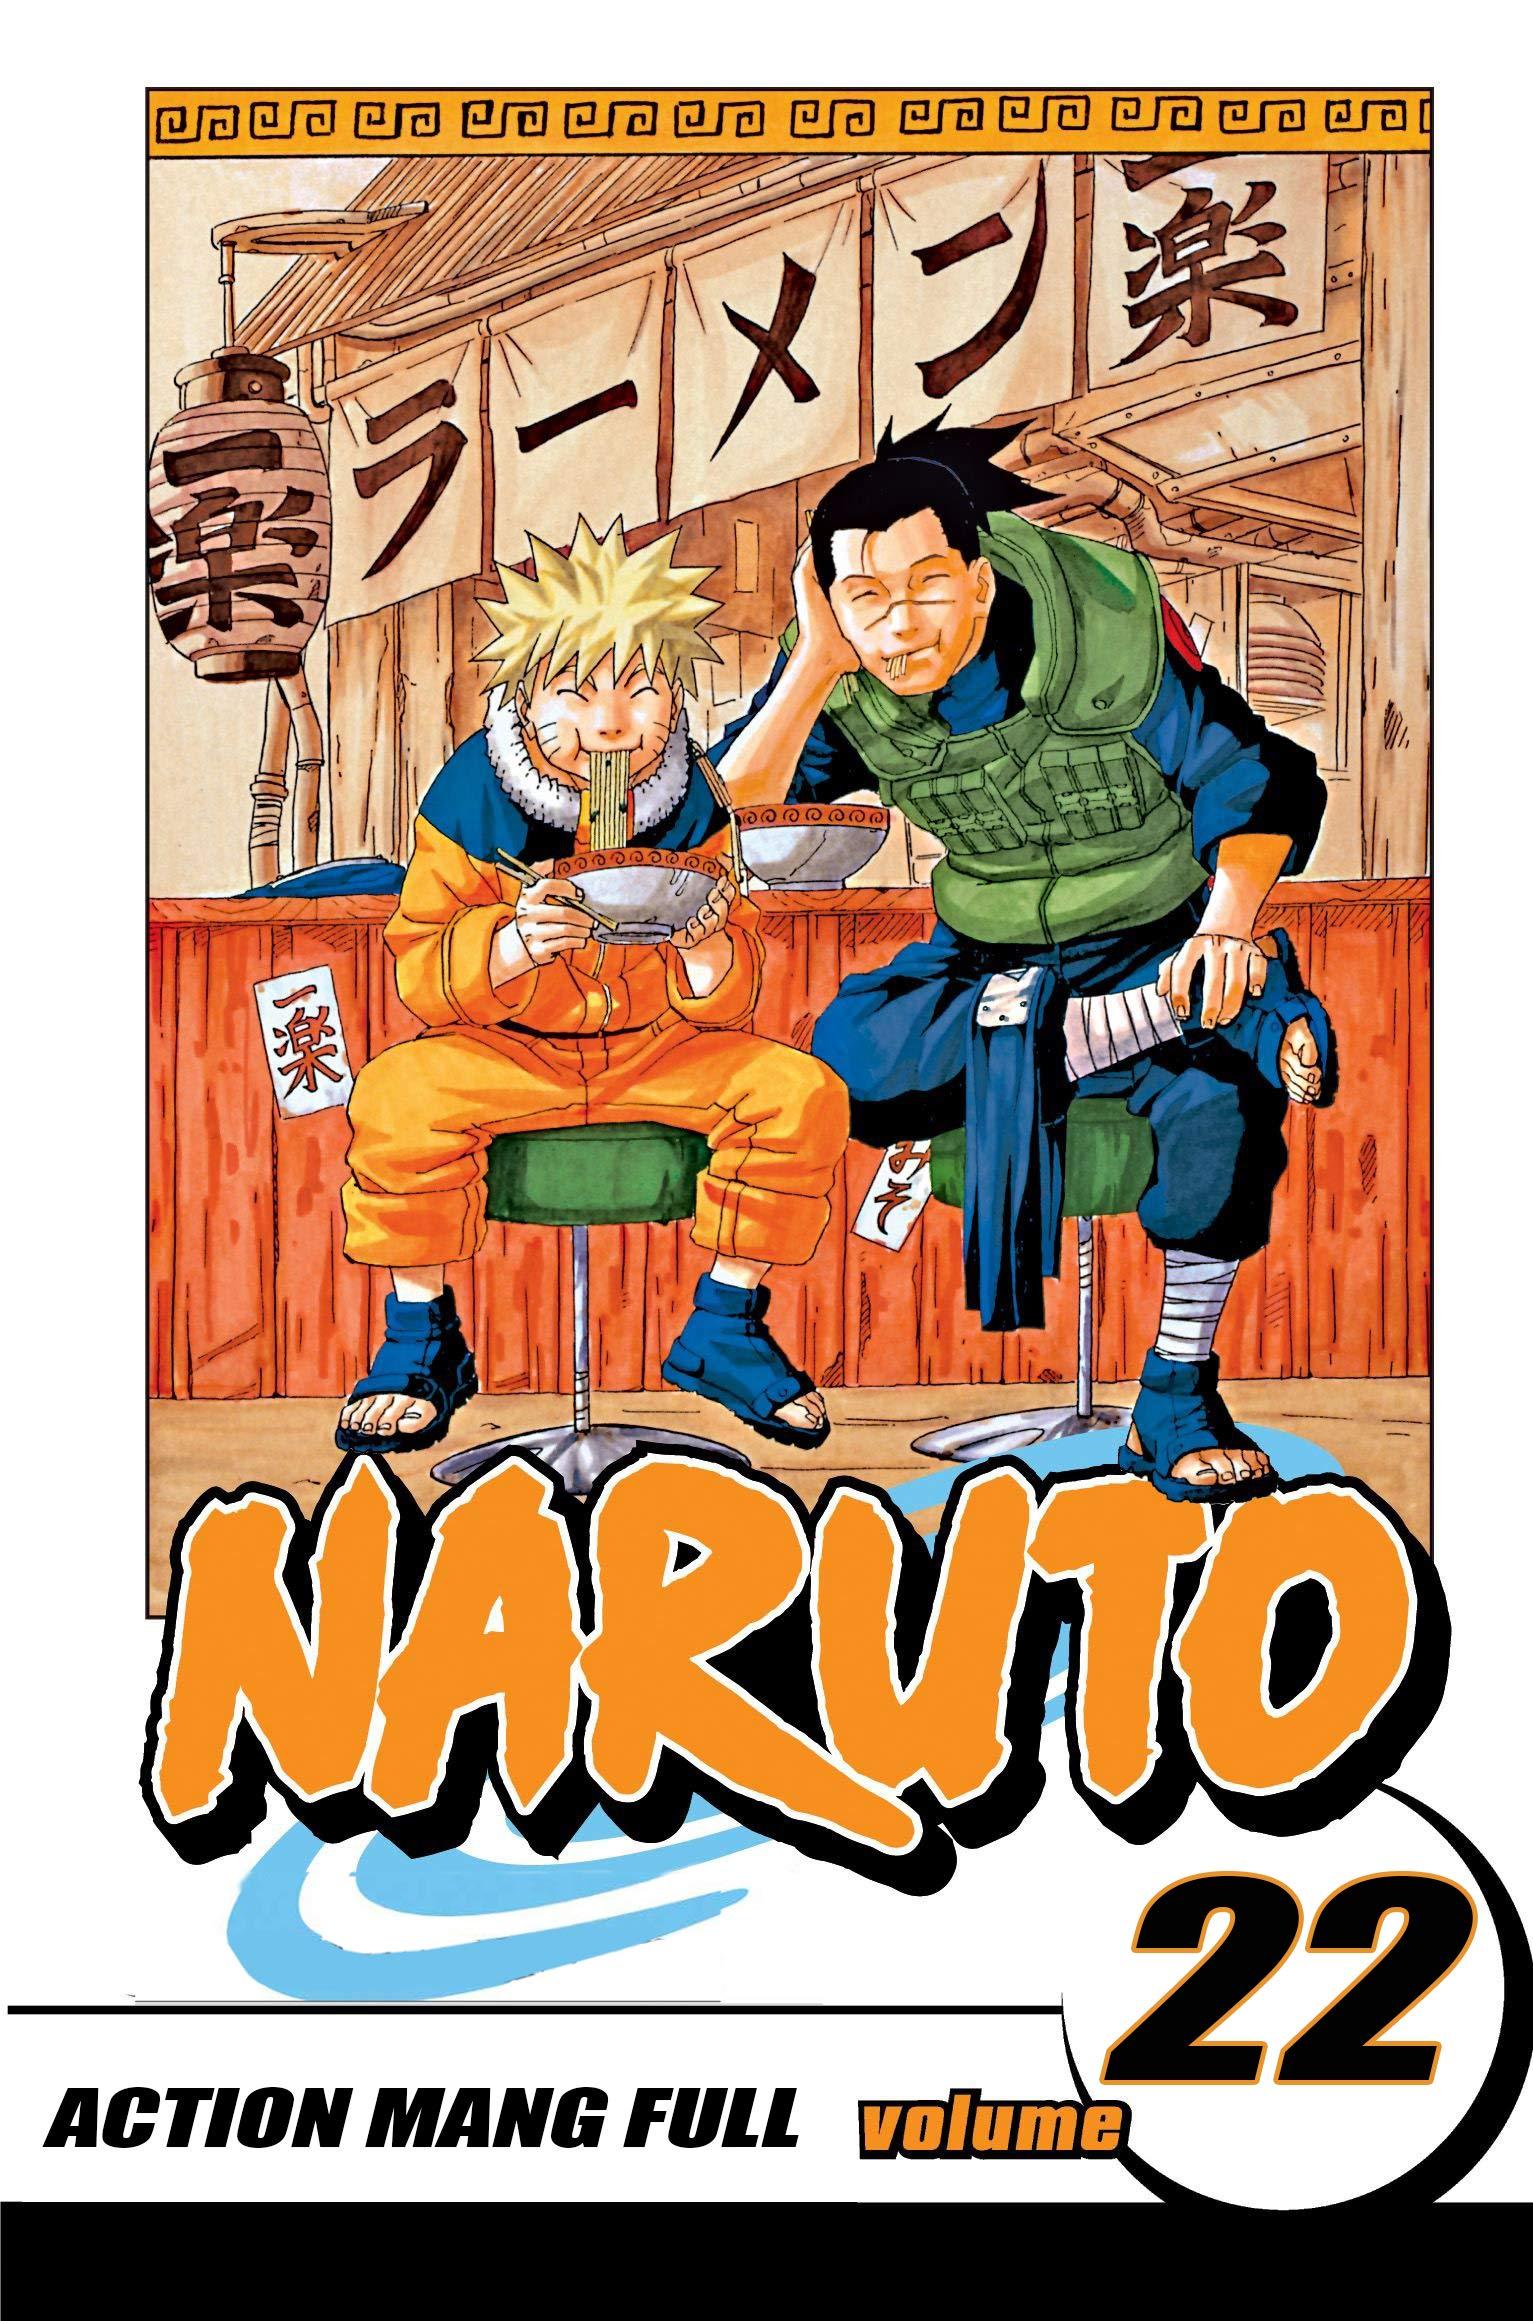 Action Manga Full Volume 22: Naruto Manga